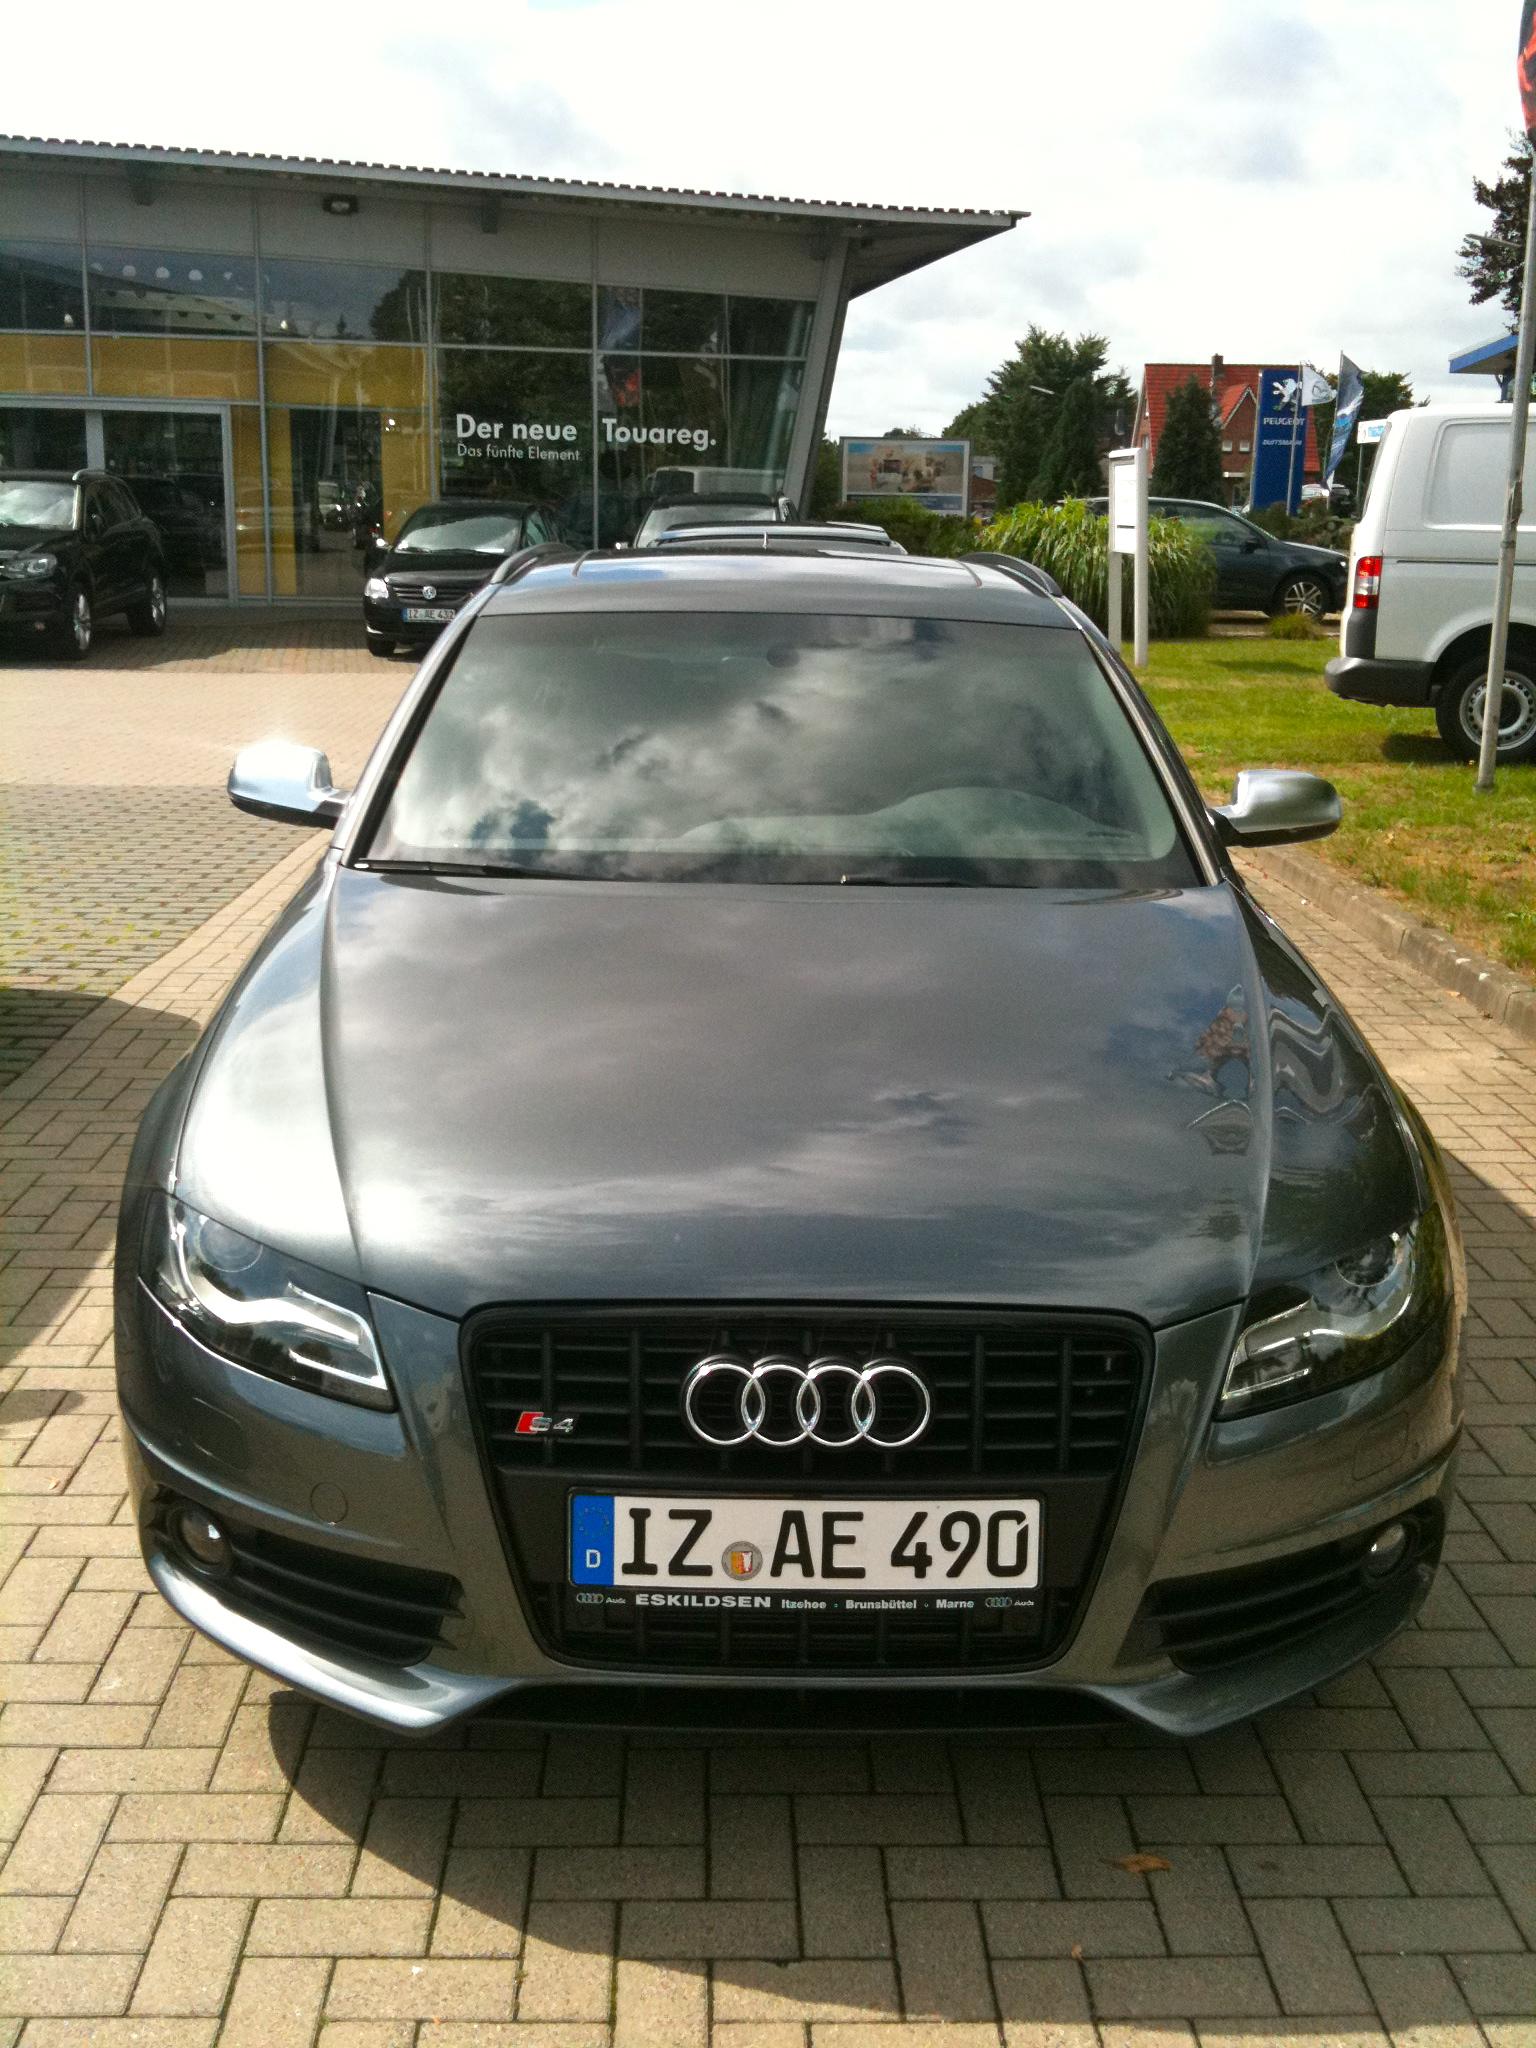 Audi s4 tfsi